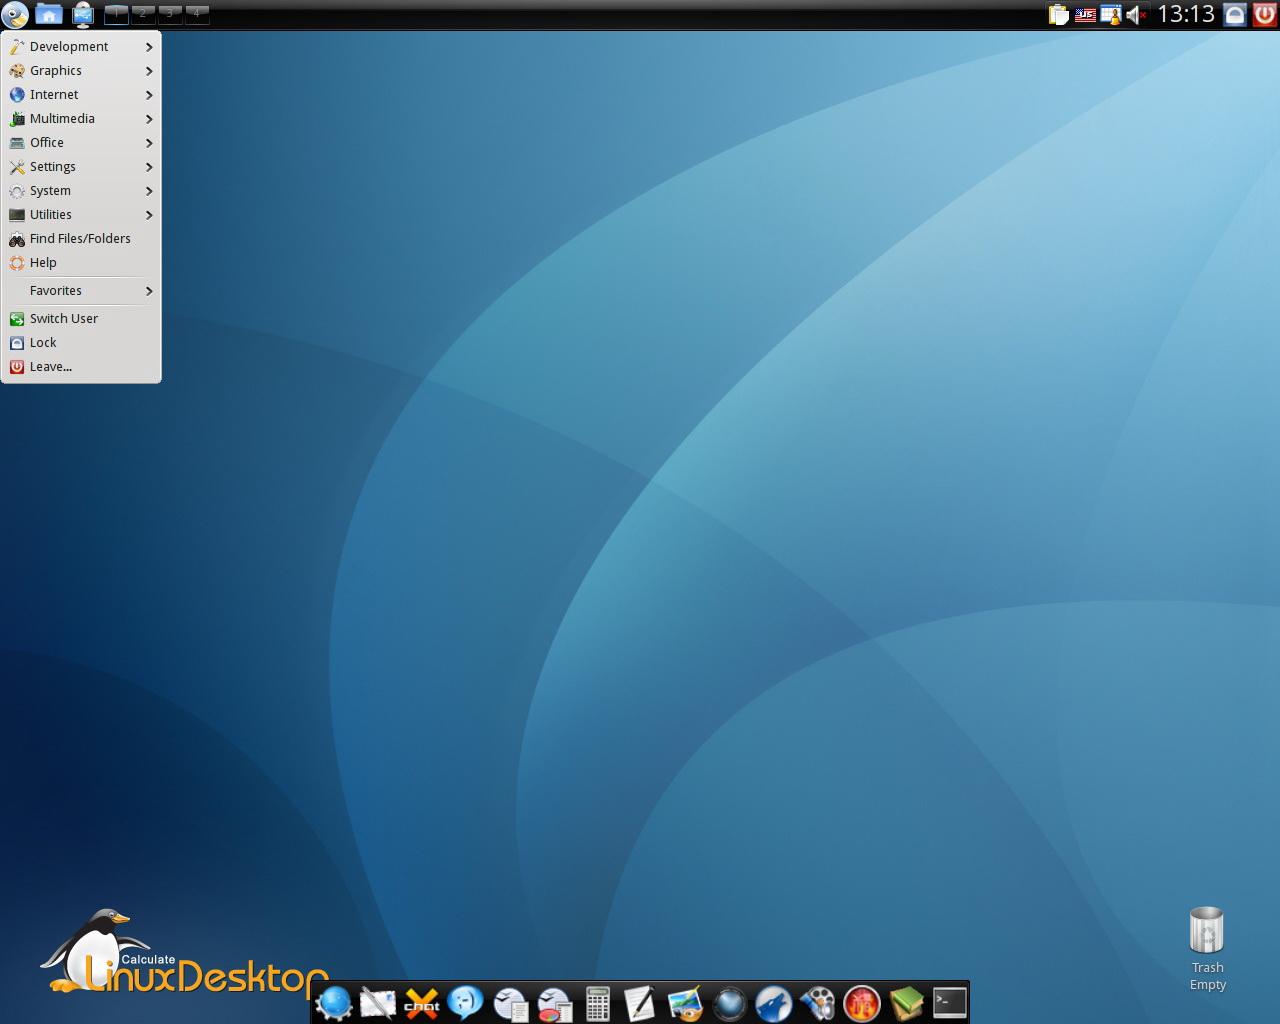 Calculate Linux Media Center截图1